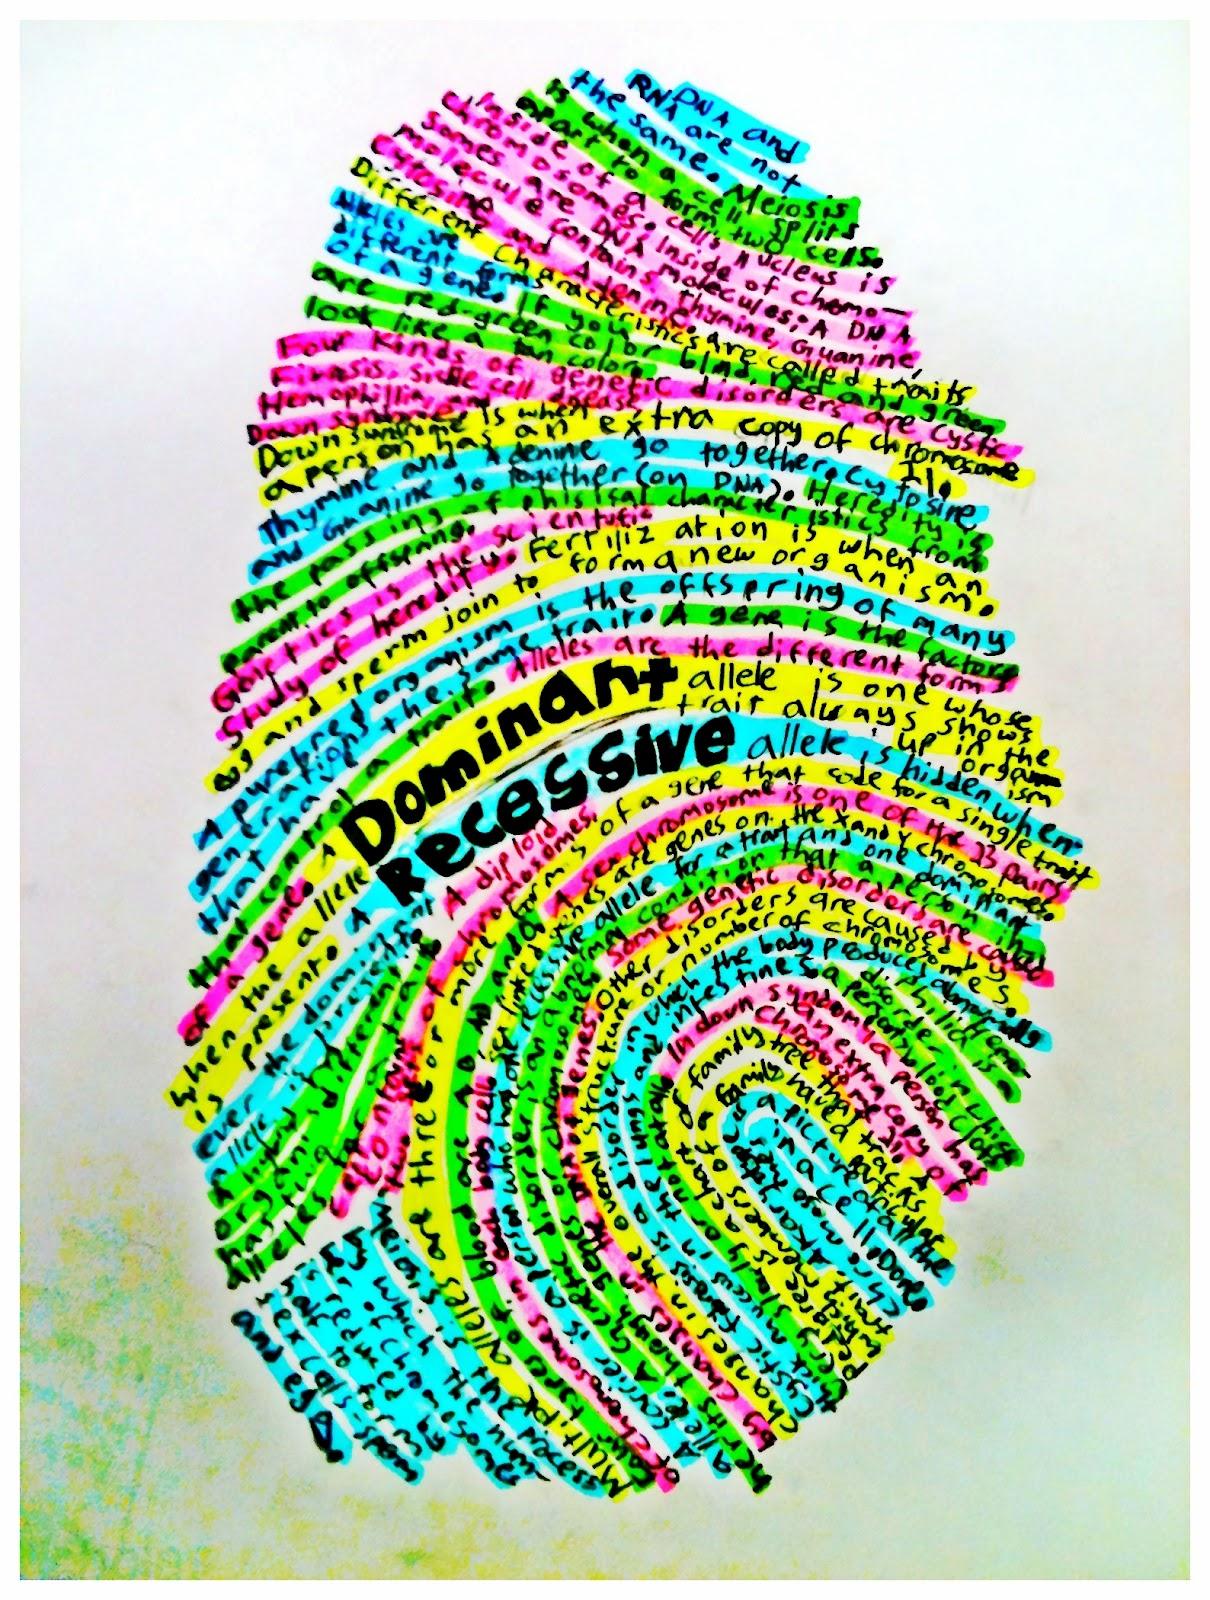 Pitotti S Panther Page Fingerprint Summaries